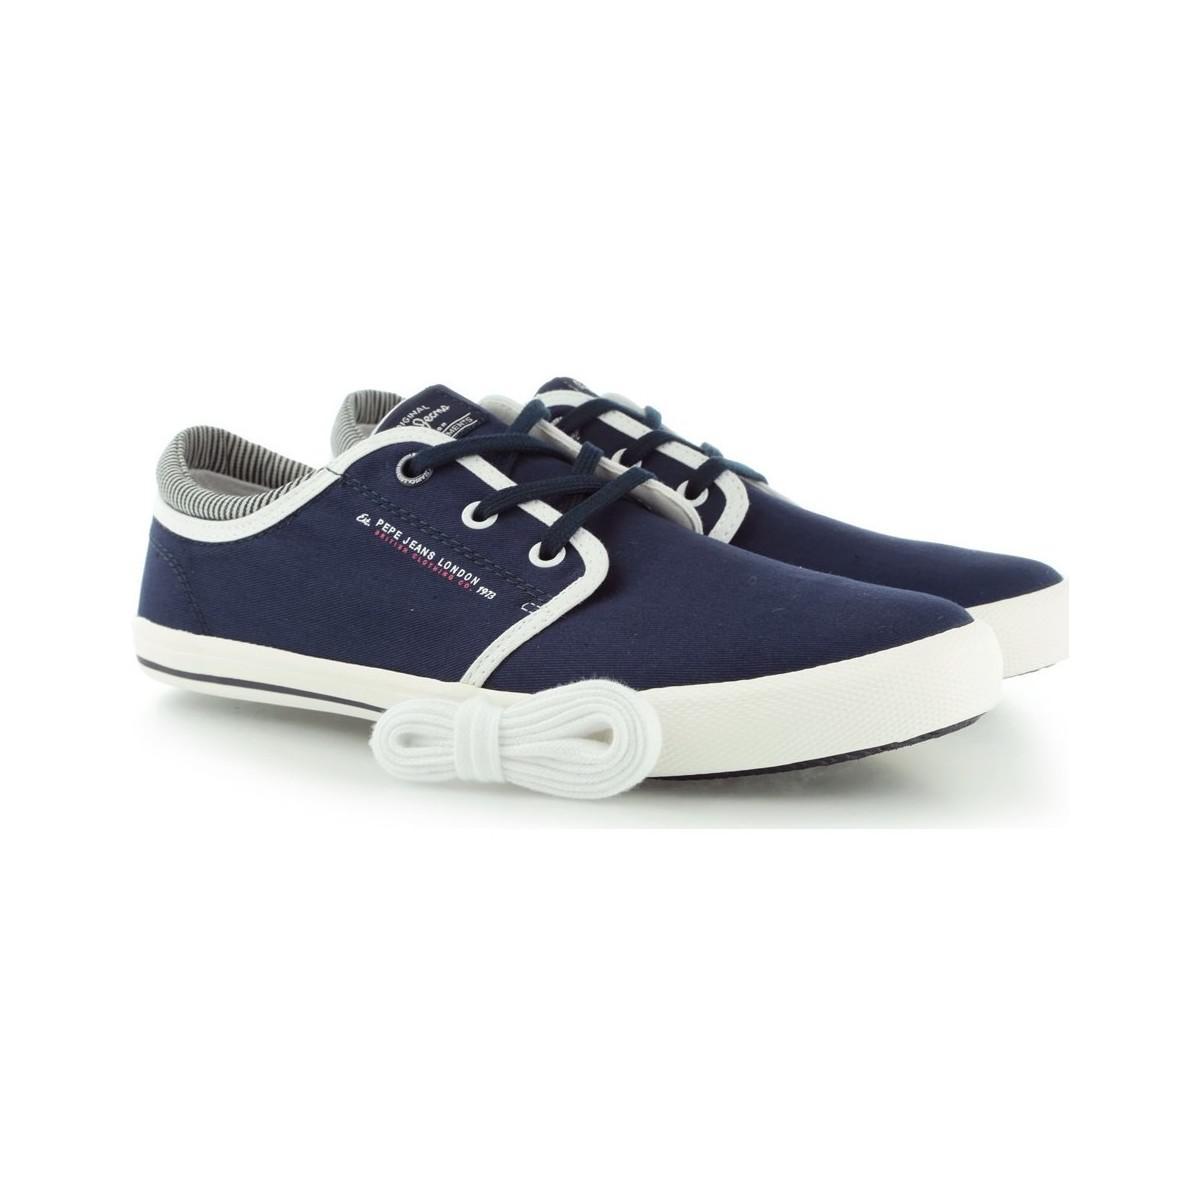 Bisgaard 50702118  38 EU Pepe jeans Chaussures Britt Collar PMS30197 Pepe jeans  Gris (Salerno Perfo/Ash/Ela Navy/LS-Nat) Chaussures Josef Seibel beiges femme K3rjY